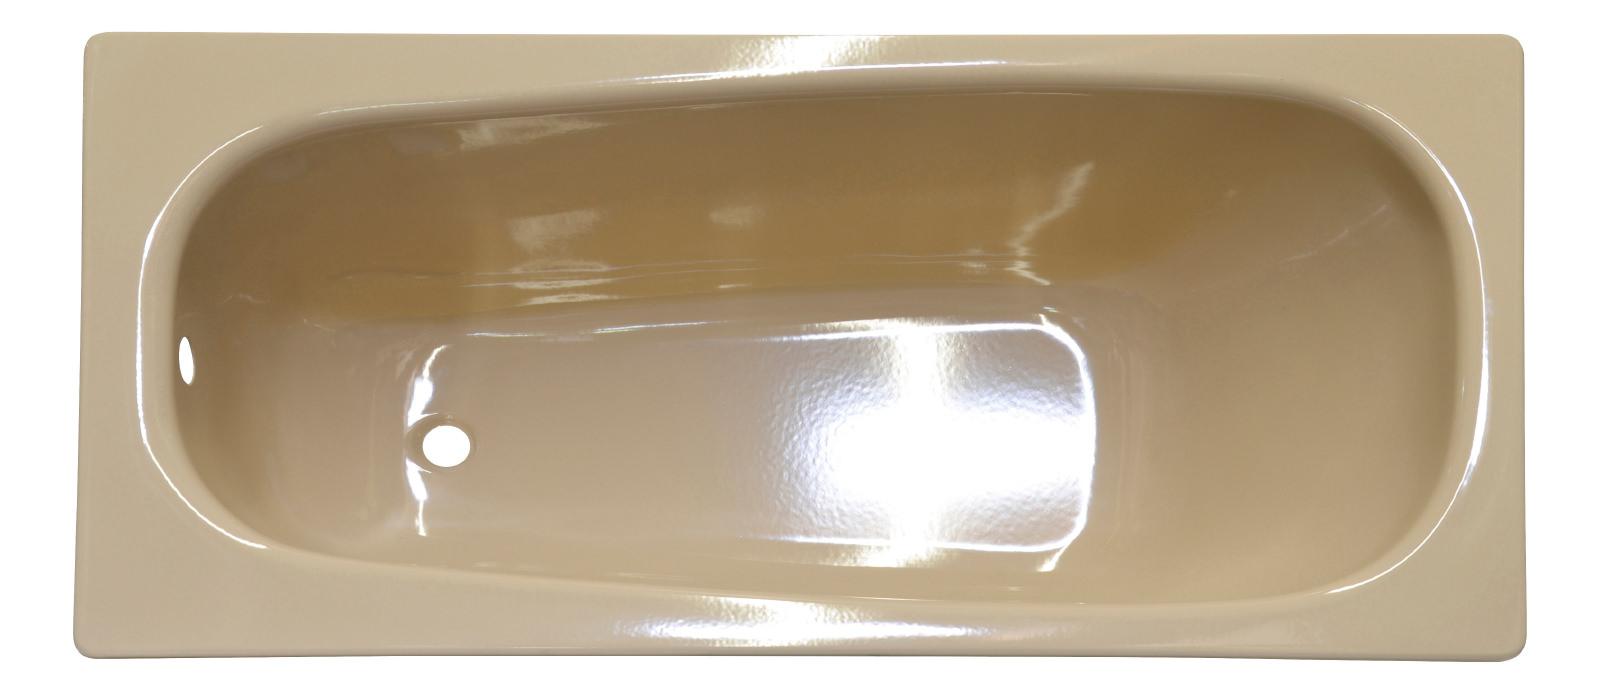 Full Size of Badewanne Stahl Betteone Bette Starlet Flair Oval Loft 190x90 One Relax V Select 160x70 Preis 180x80 Kinder Betten Duschwanne Günstig Kaufen 180x200 Hasena Bett Badewanne Bette